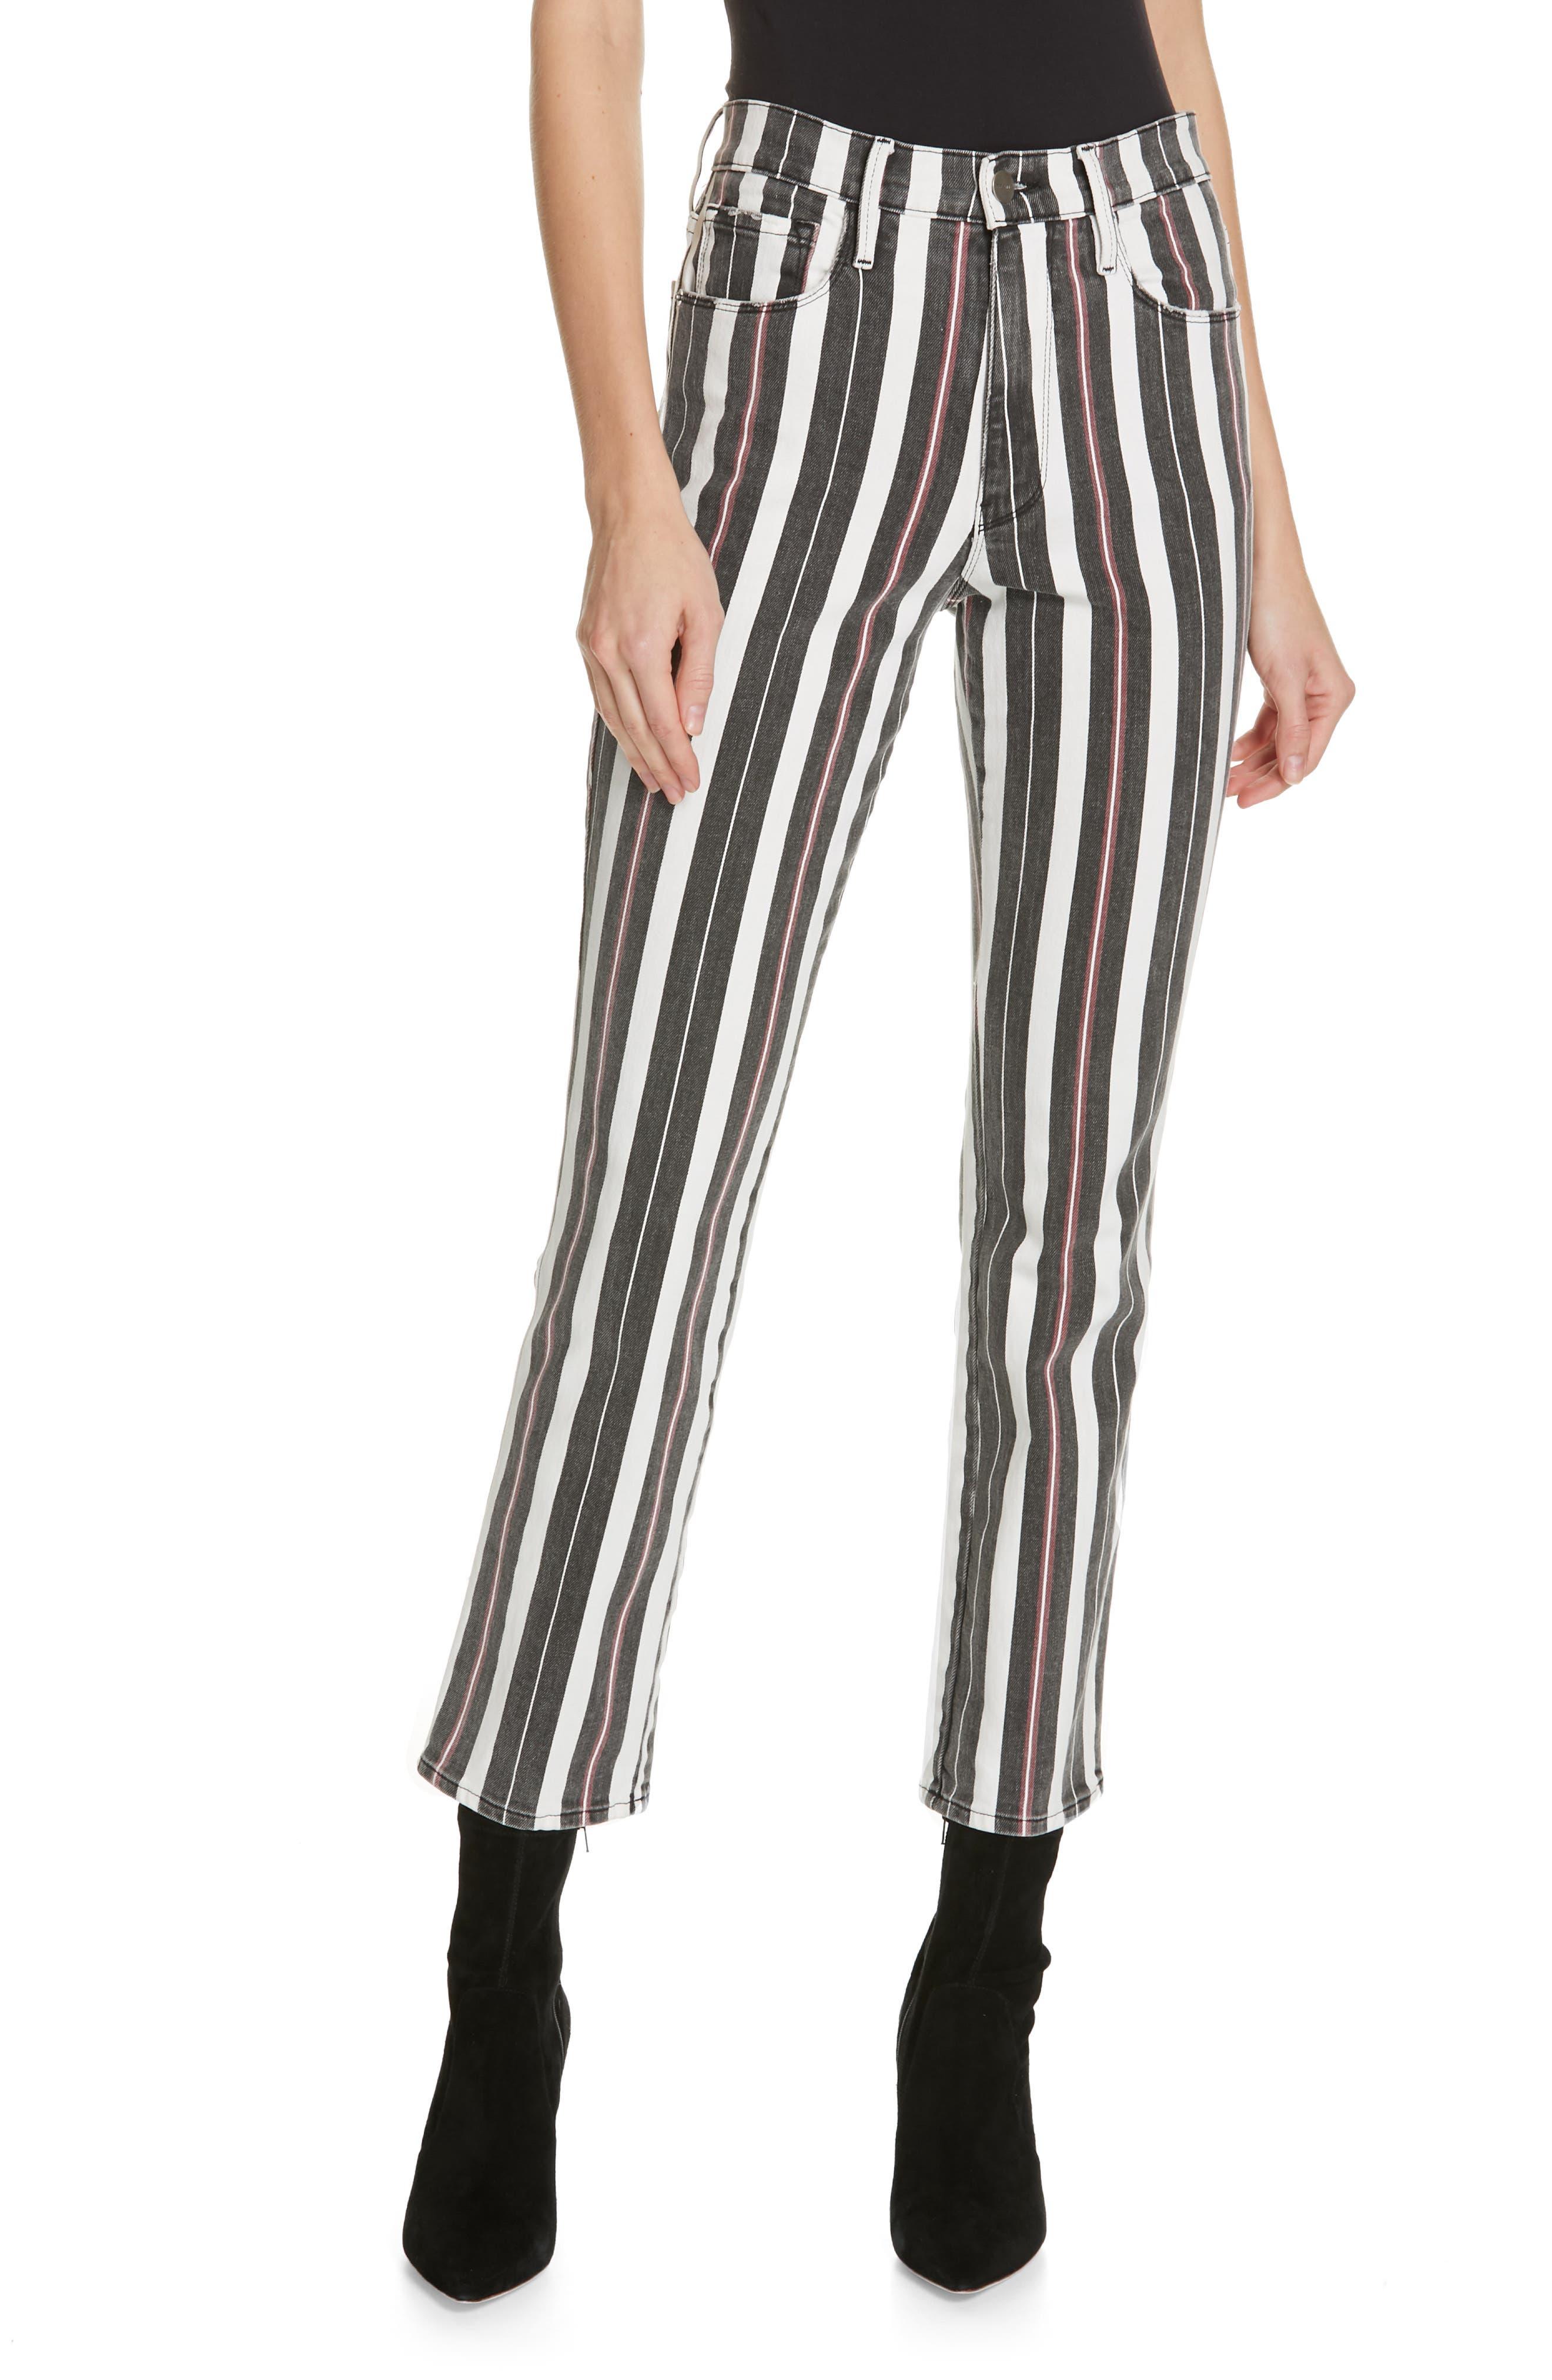 Le Sylvie Band Stripe Straight Leg Jeans,                             Main thumbnail 1, color,                             BAND STRIPE